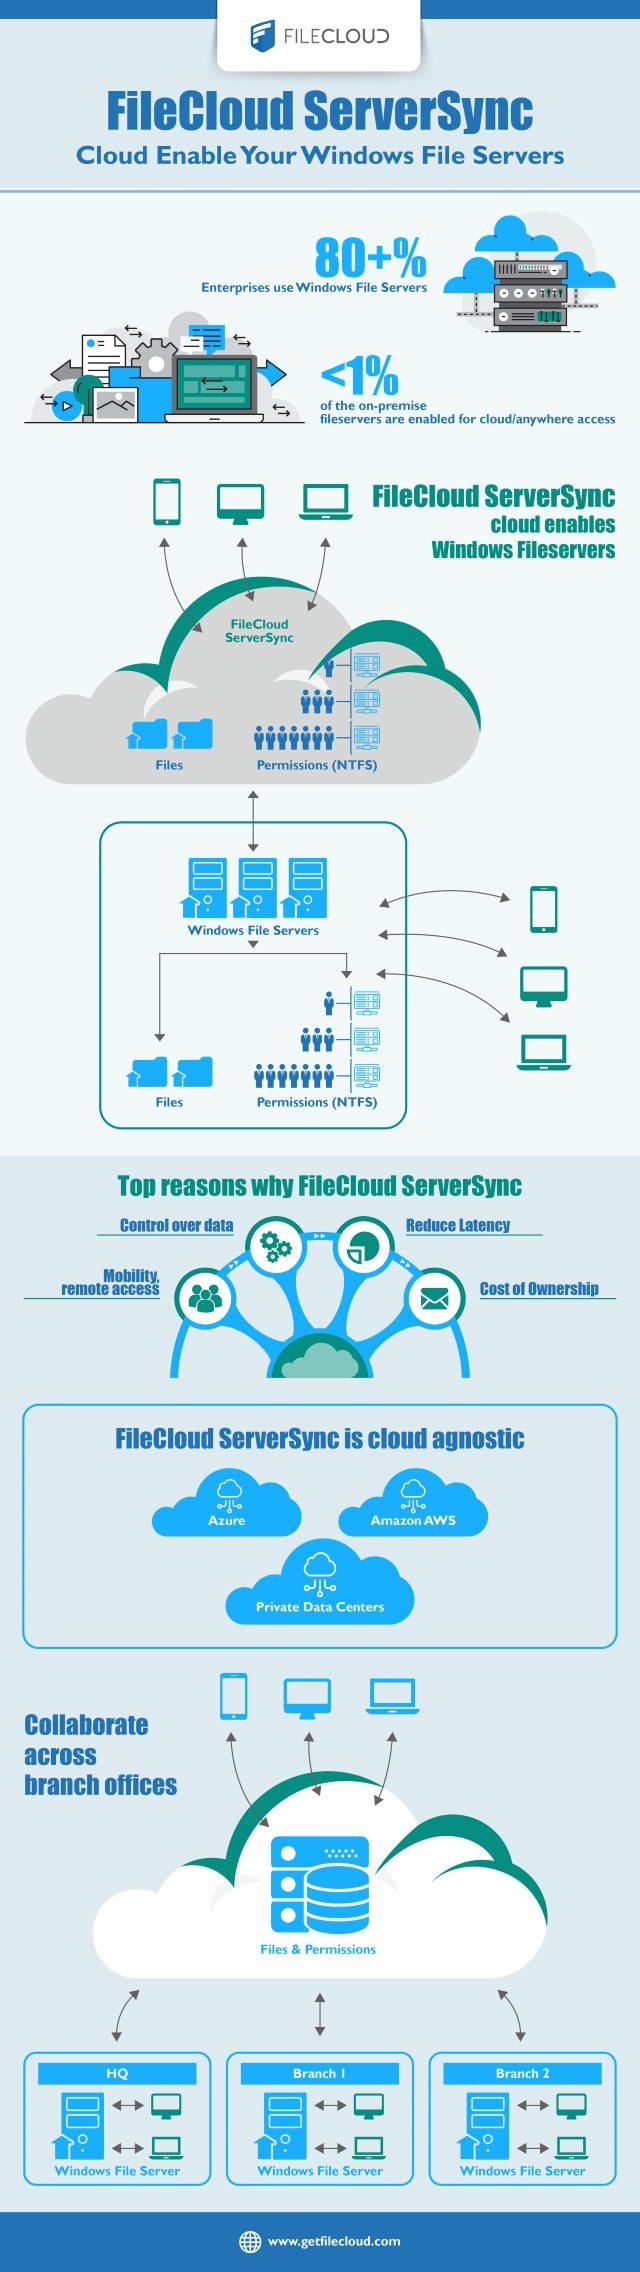 FileCloud ServerSync - Infographic